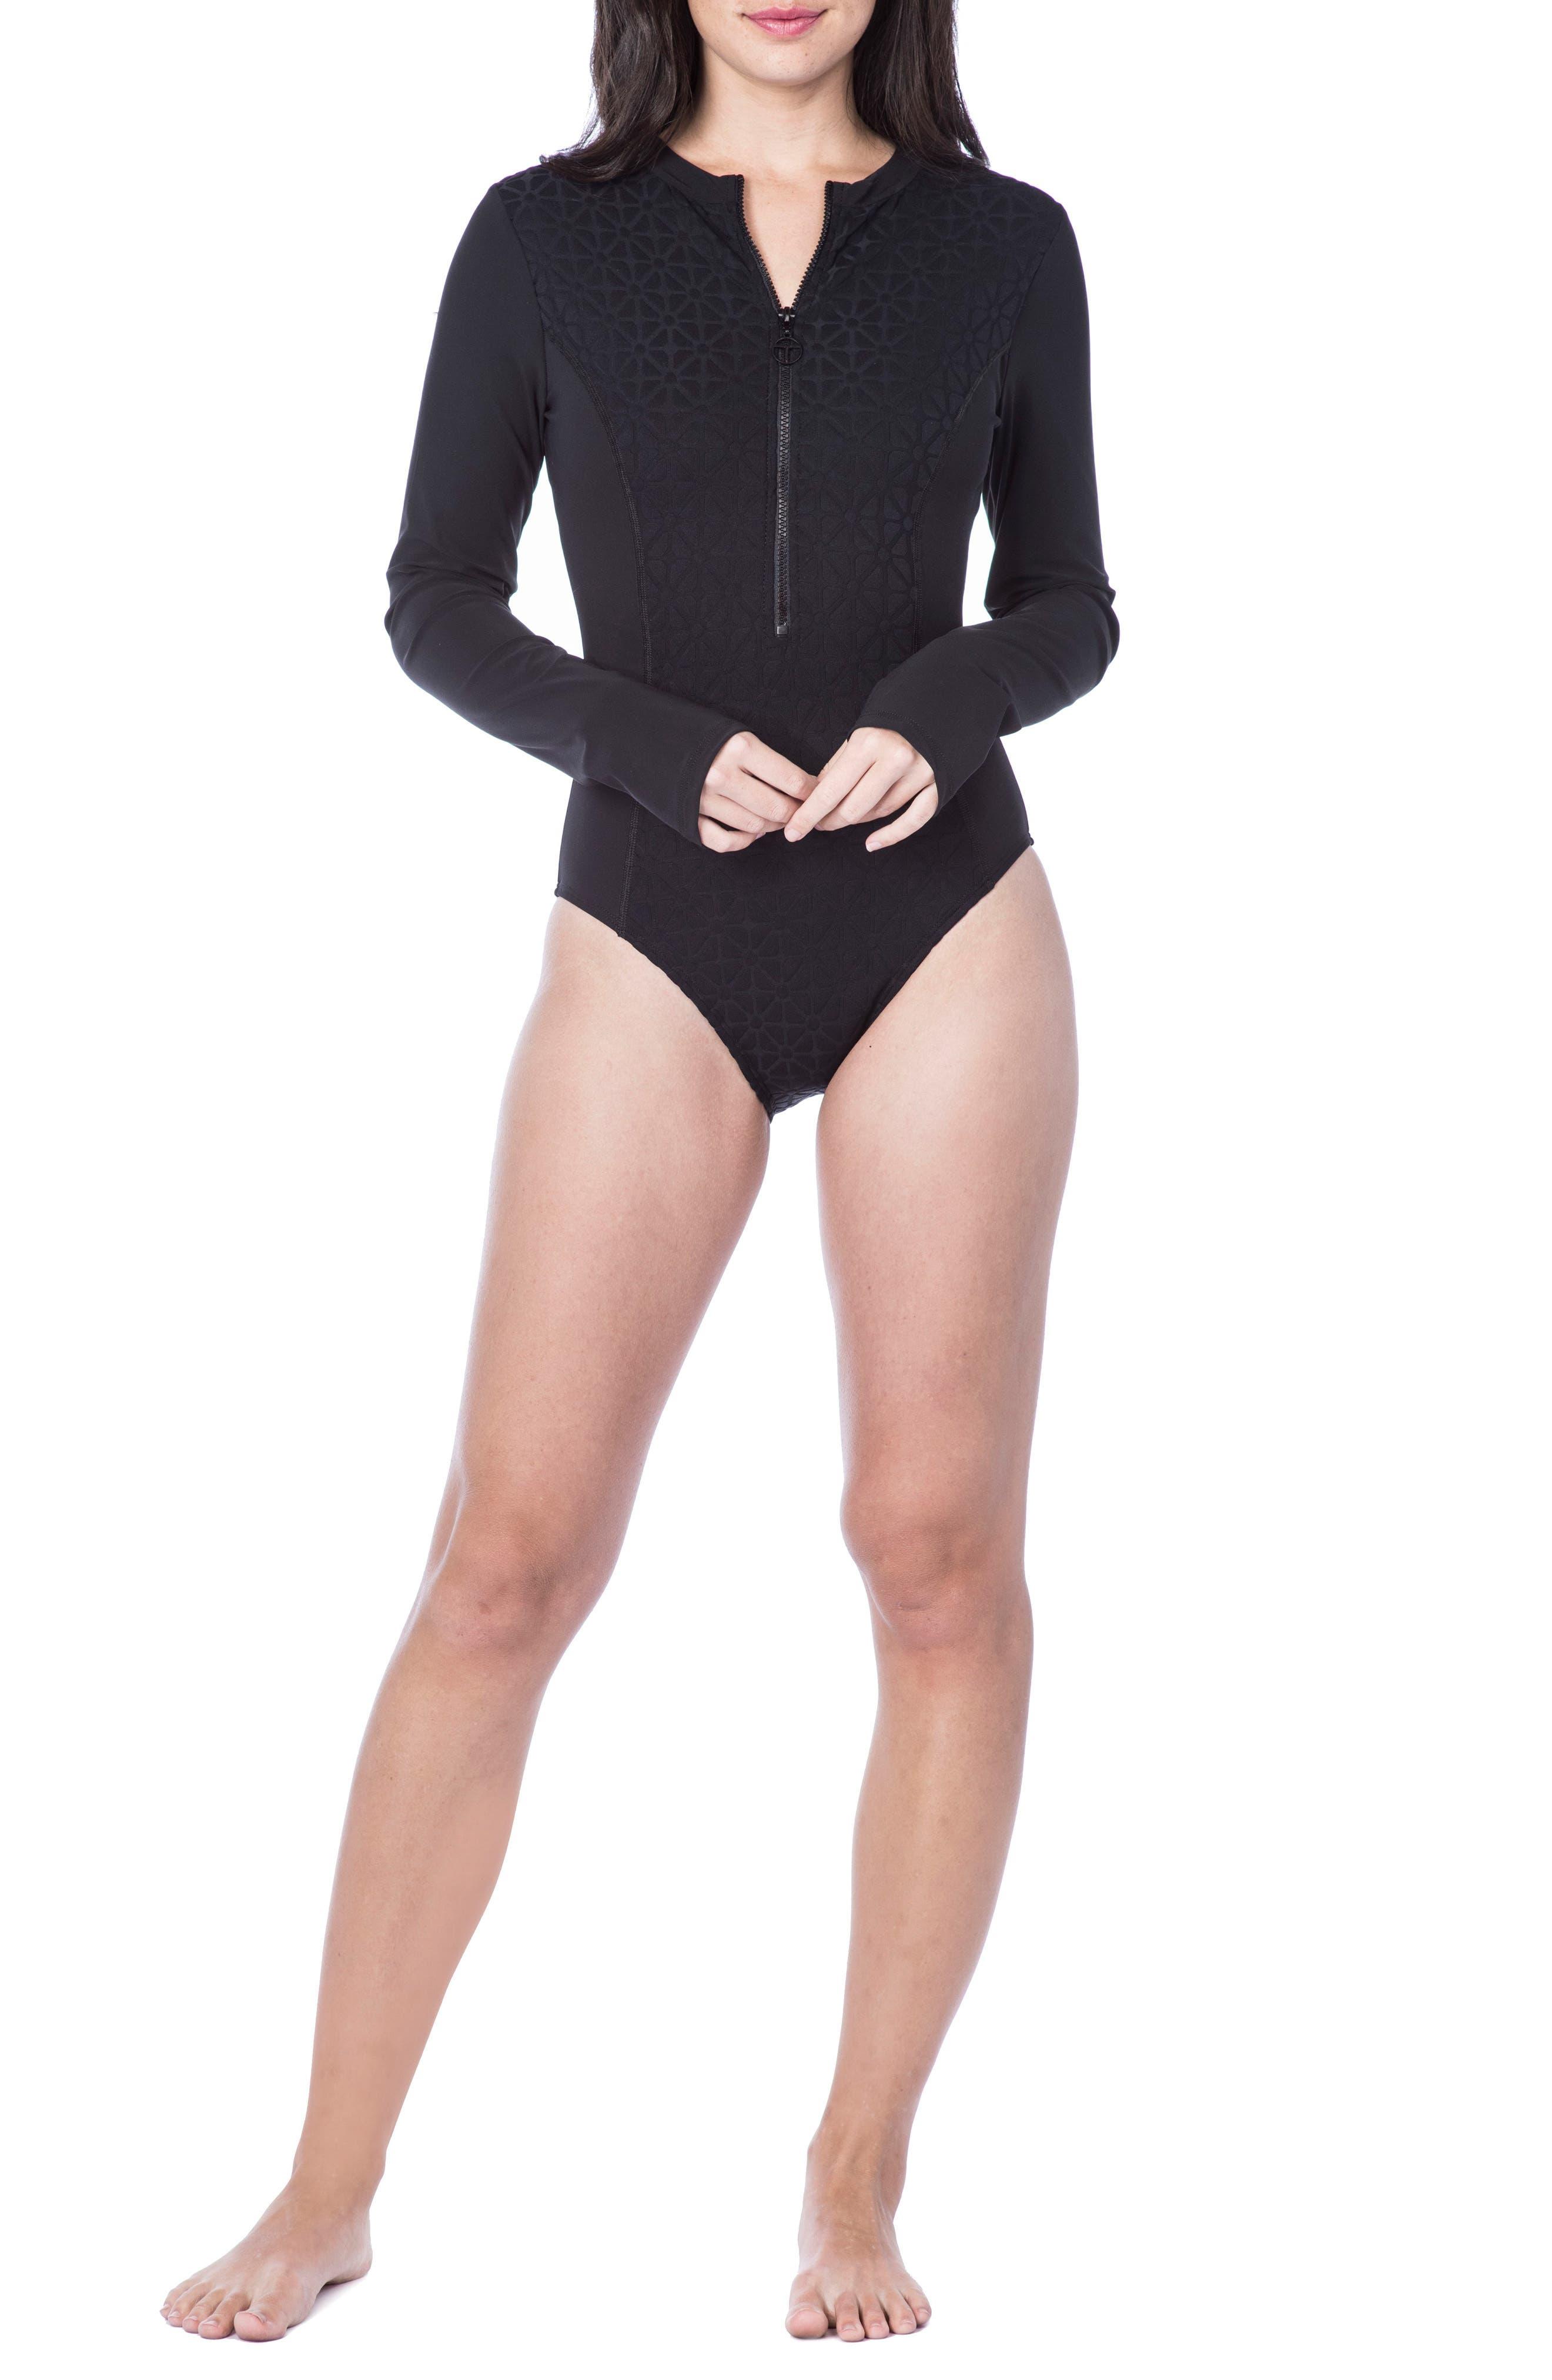 Alternate Image 1 Selected - Trina Turk Sunshine Jacquard One-Piece Paddle Suit